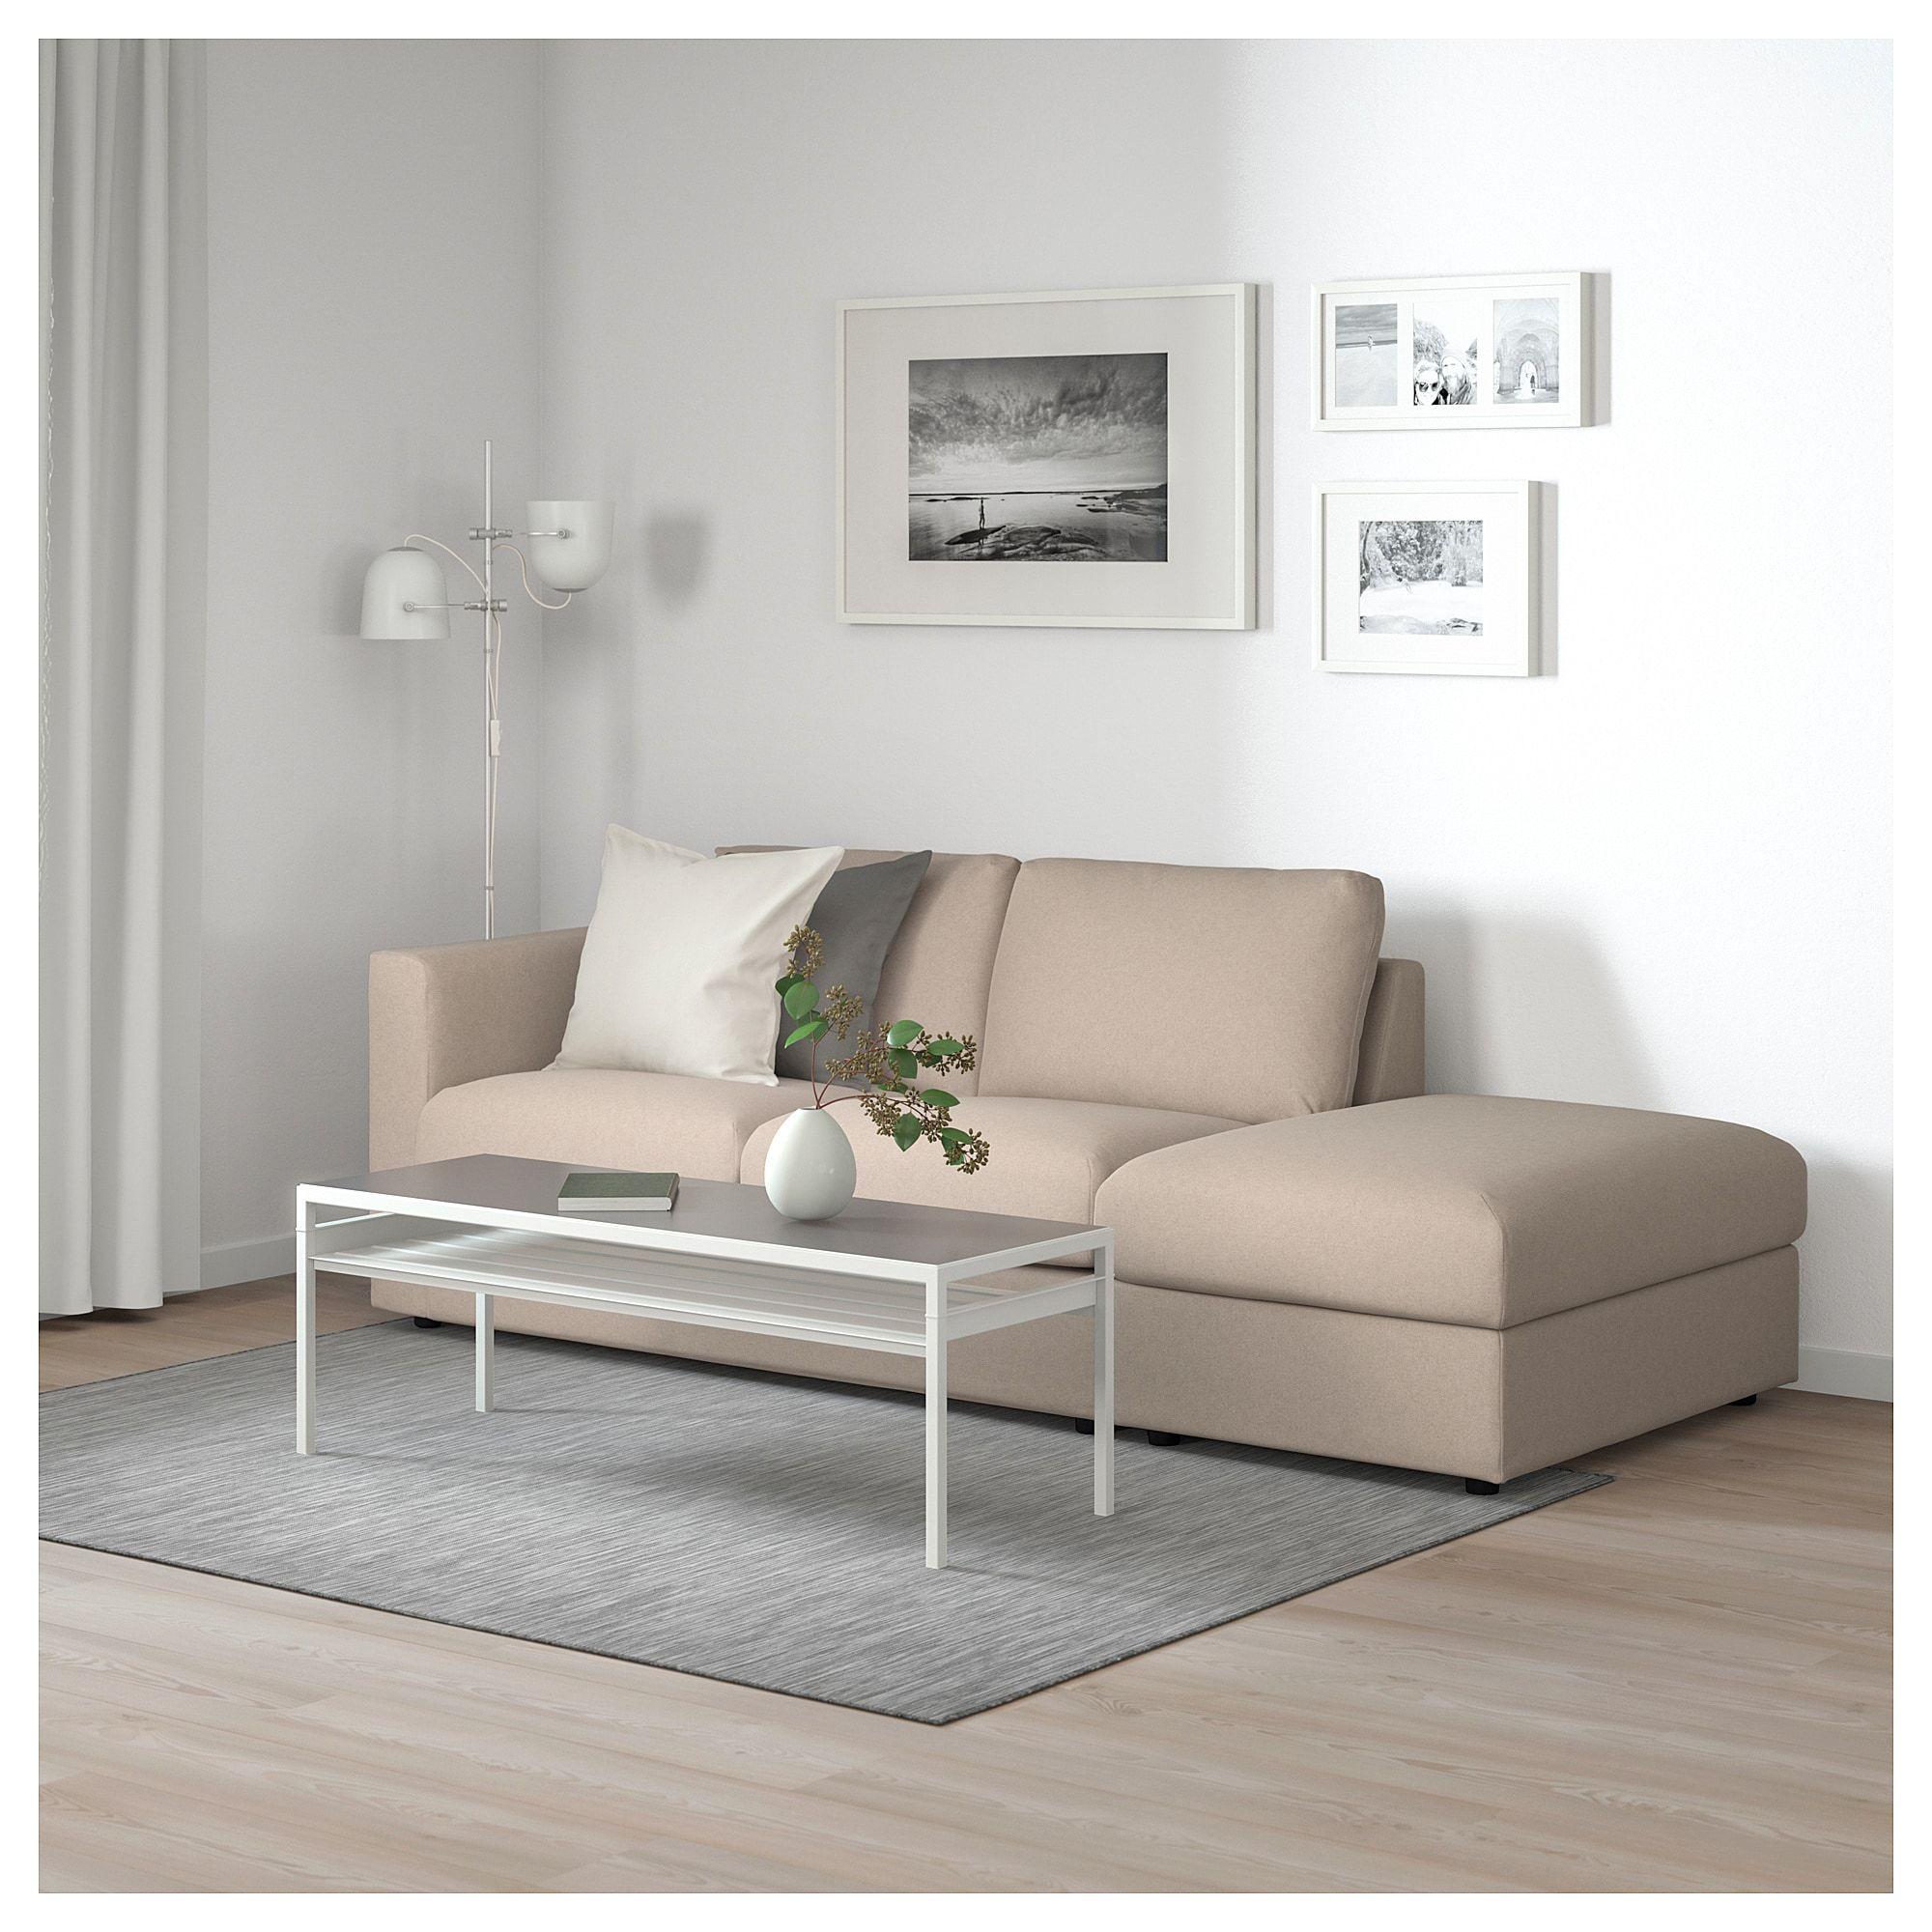 Furniture Home Furnishings Find Your Inspiration Three Seat Sofa Furniture Sofa